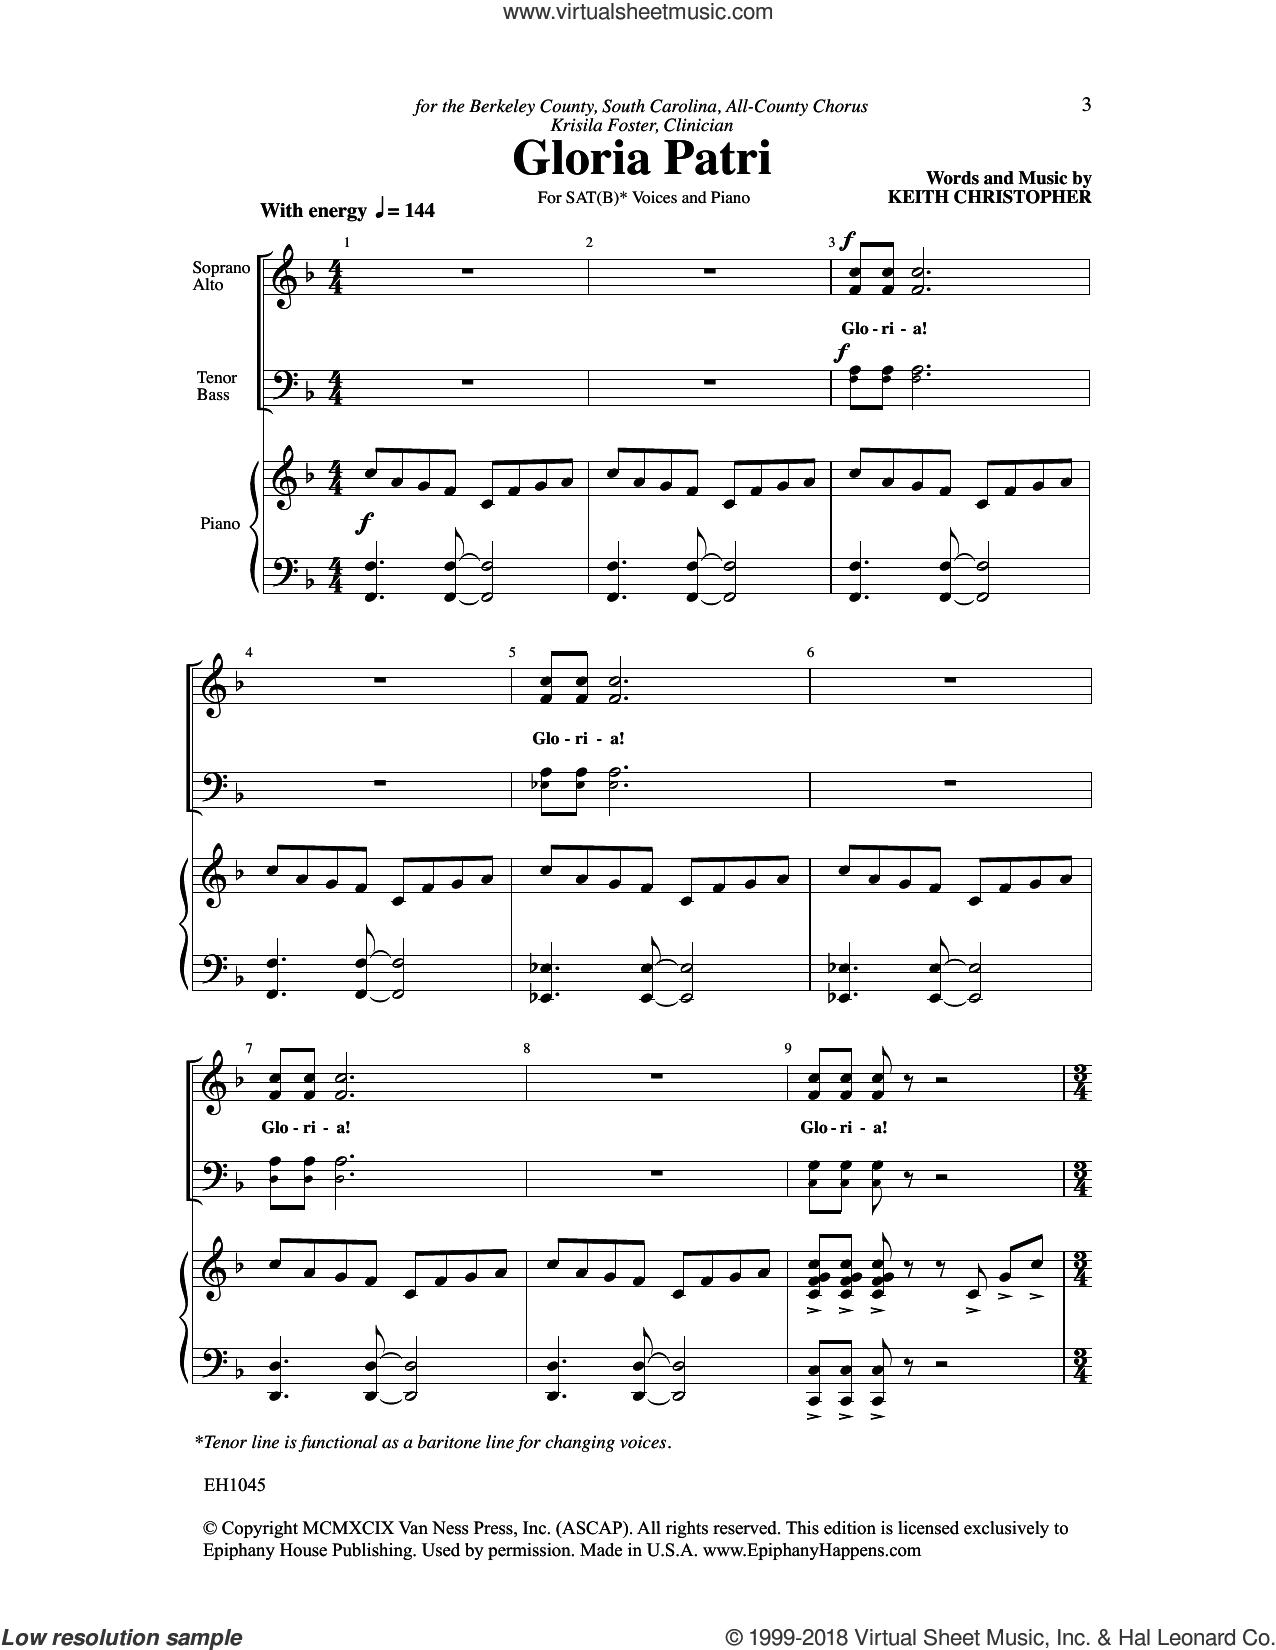 Gloria Patri sheet music for choir (SATB: soprano, alto, tenor, bass) by Keith Christopher, intermediate skill level